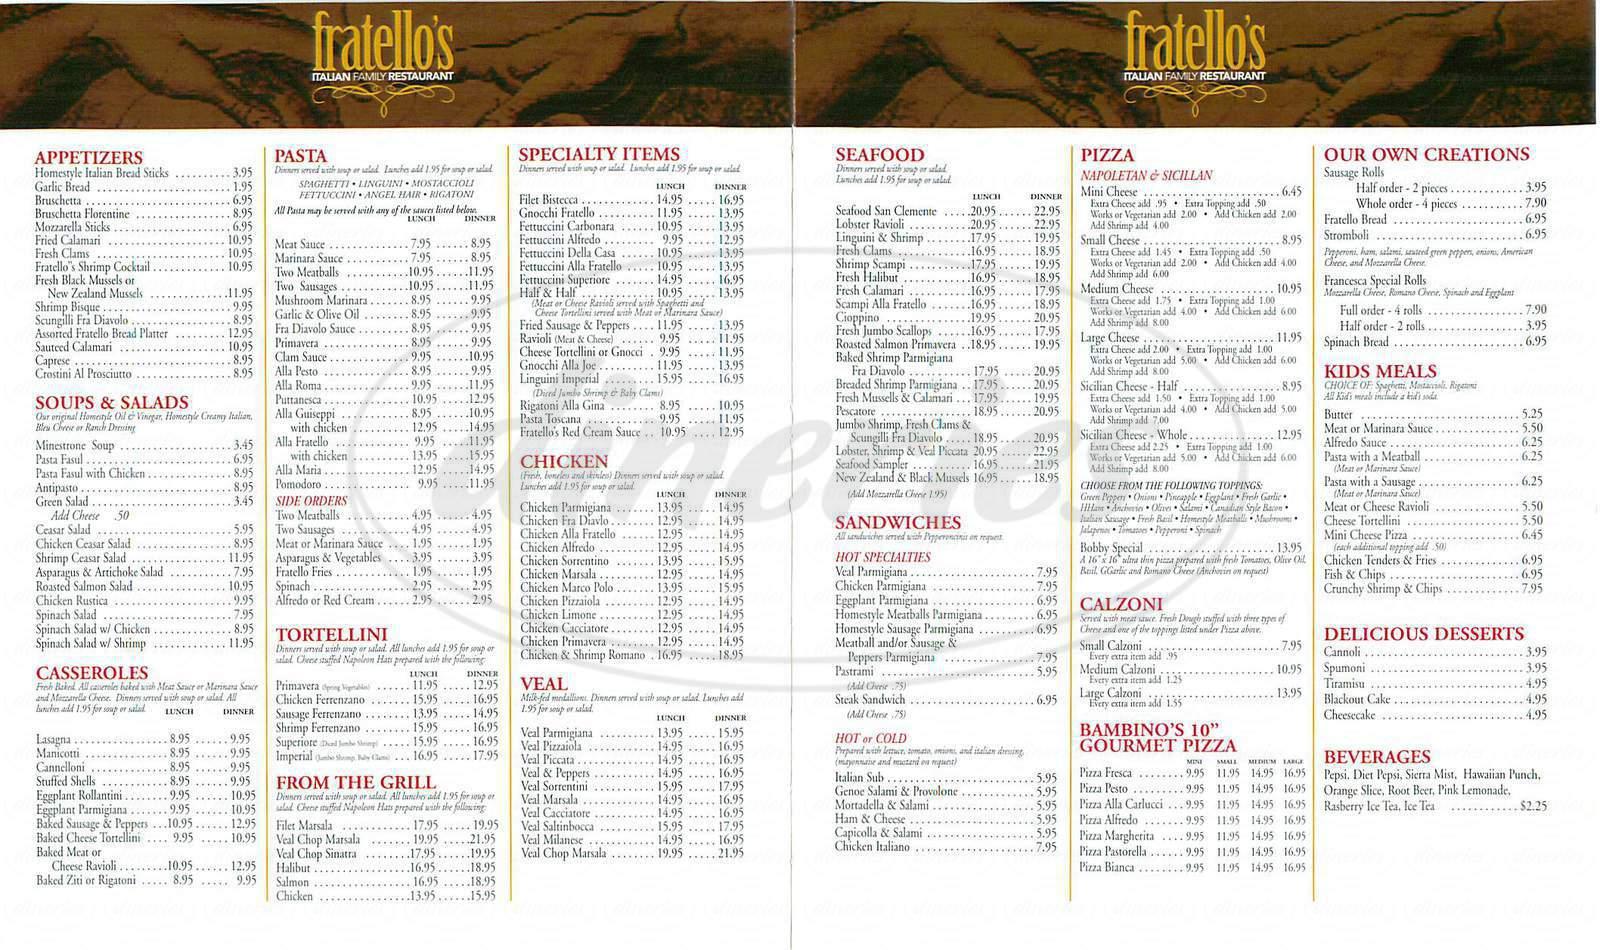 menu for Fratello's Italian Restaurant